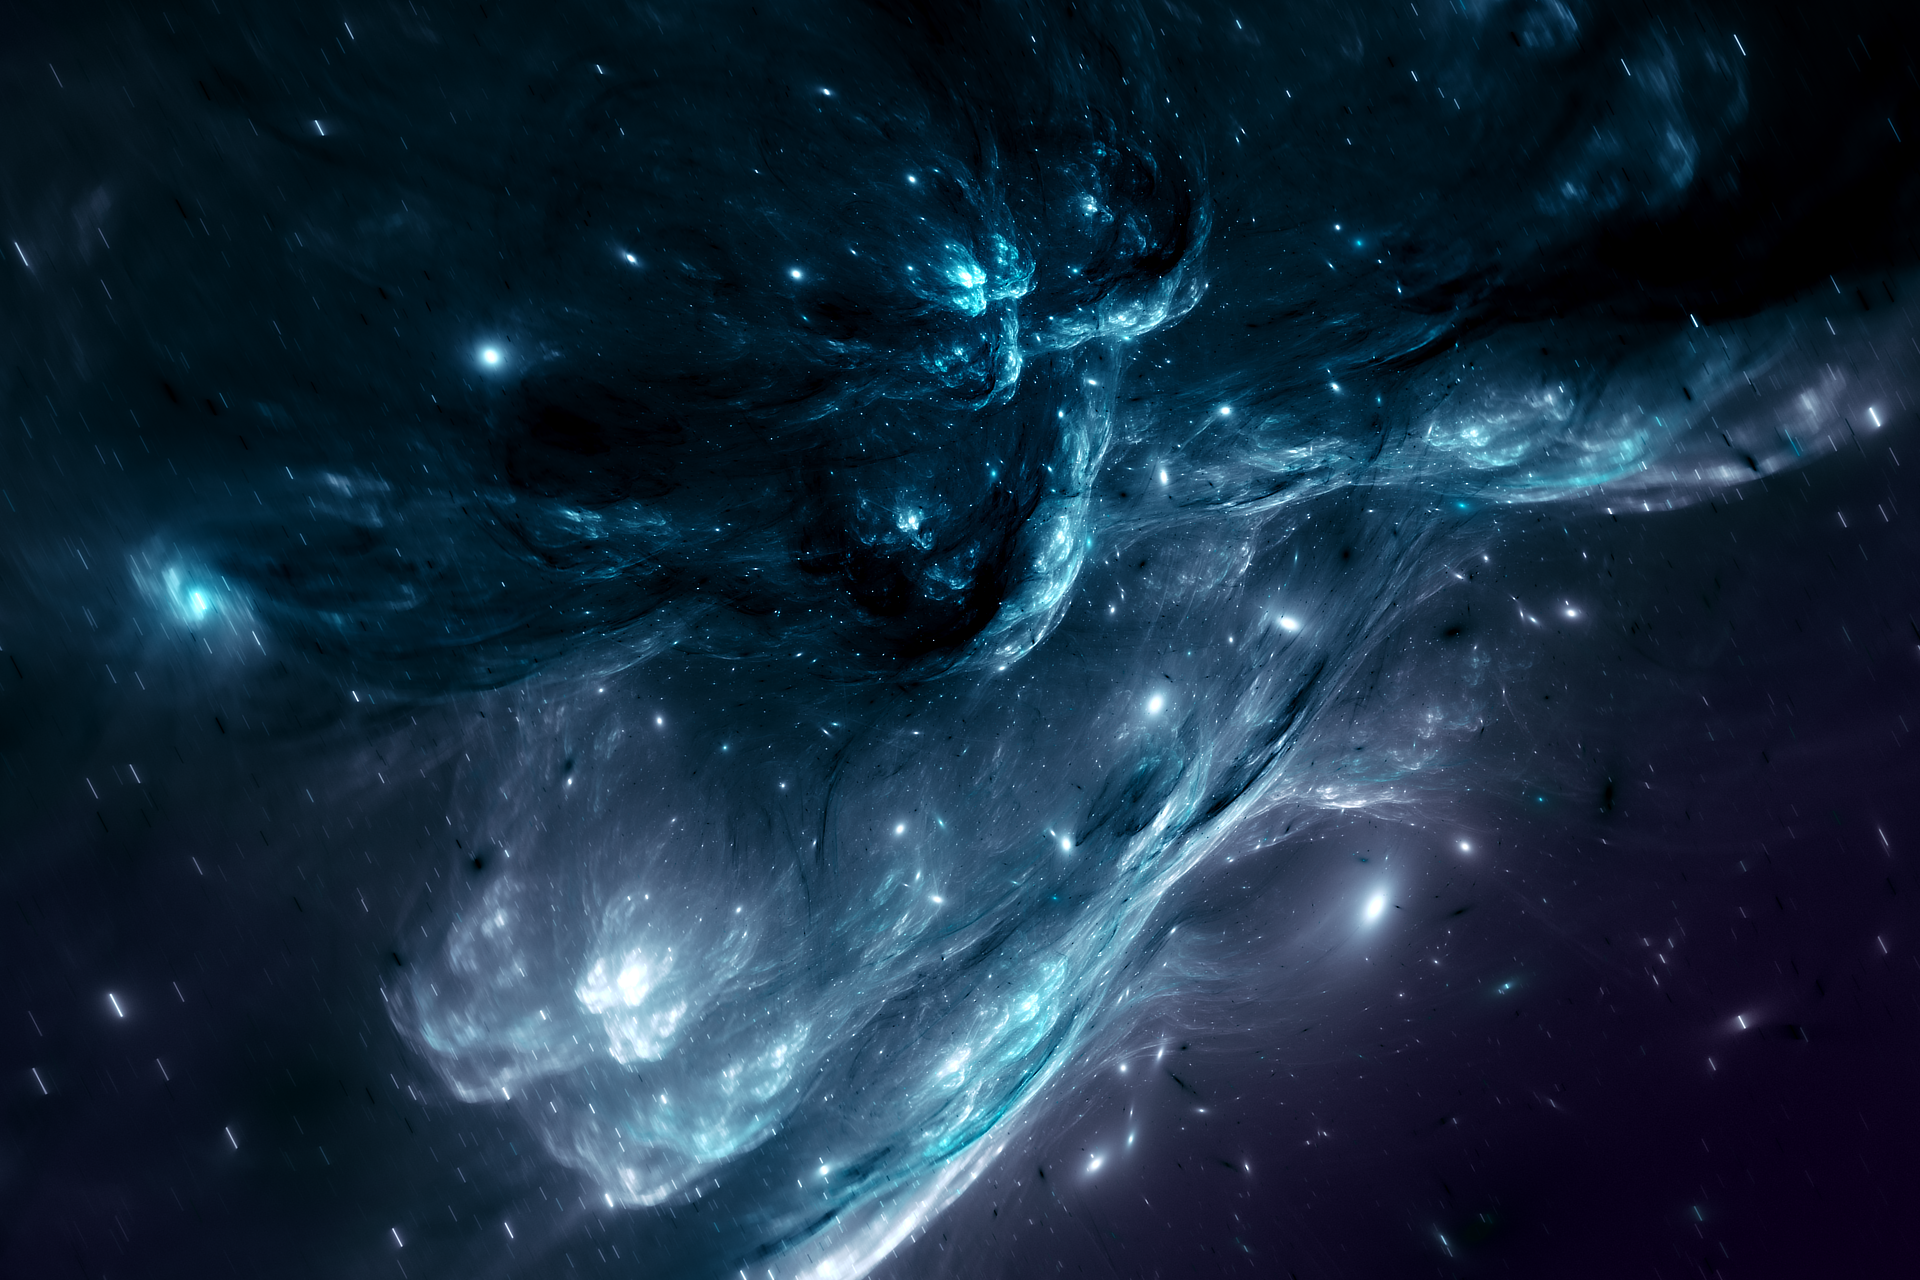 Blue space nebula hd wallpaper hintergrund 1920x1280 - Blue space hd ...